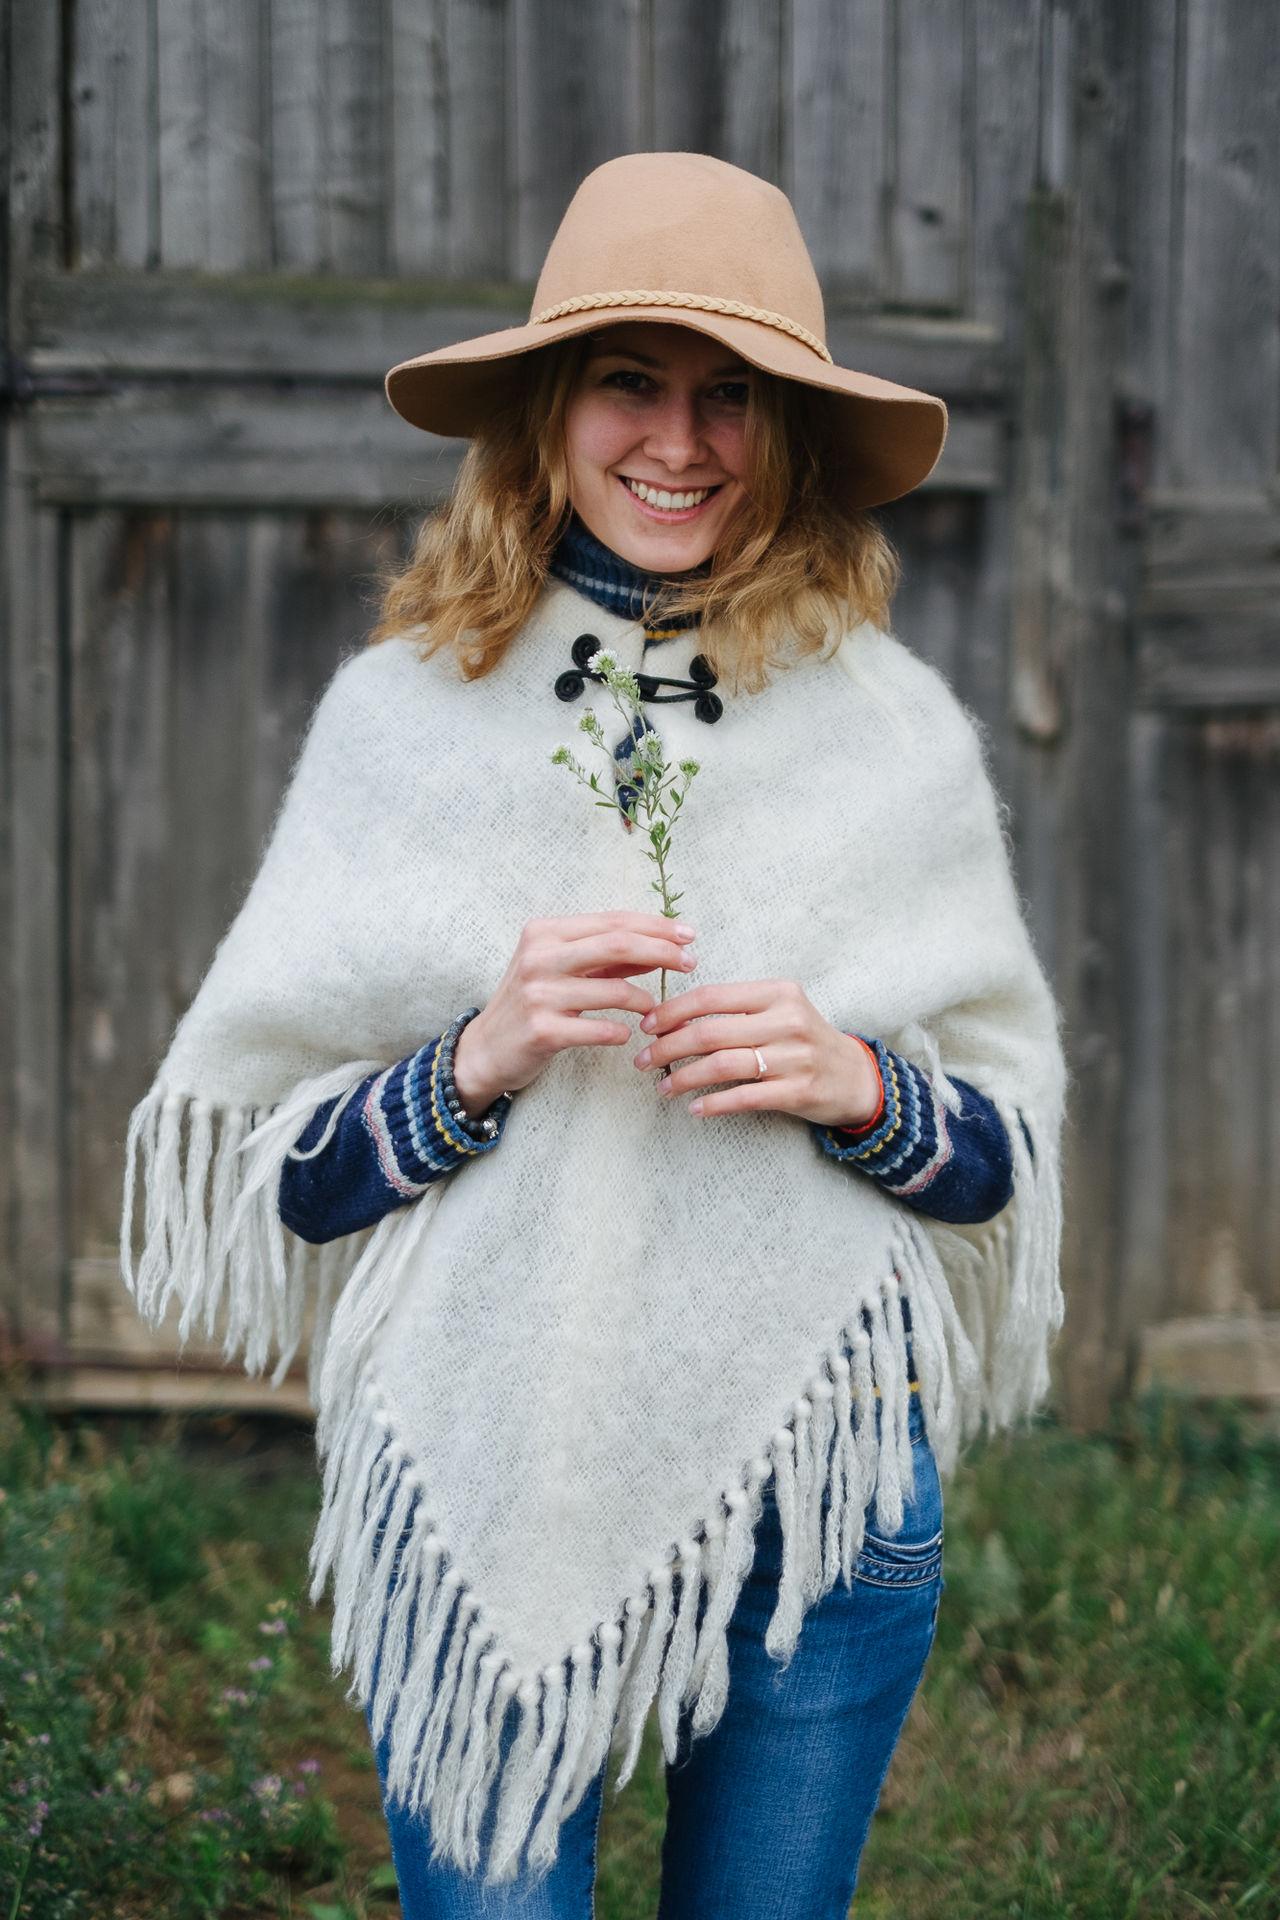 Boho Casual Clothing First Eyeem Photo Folk Folkstyle Fujifilm Fujifilmru Girl Kinfolk Lifefolk Lifestyles Outdoors Russian Girl